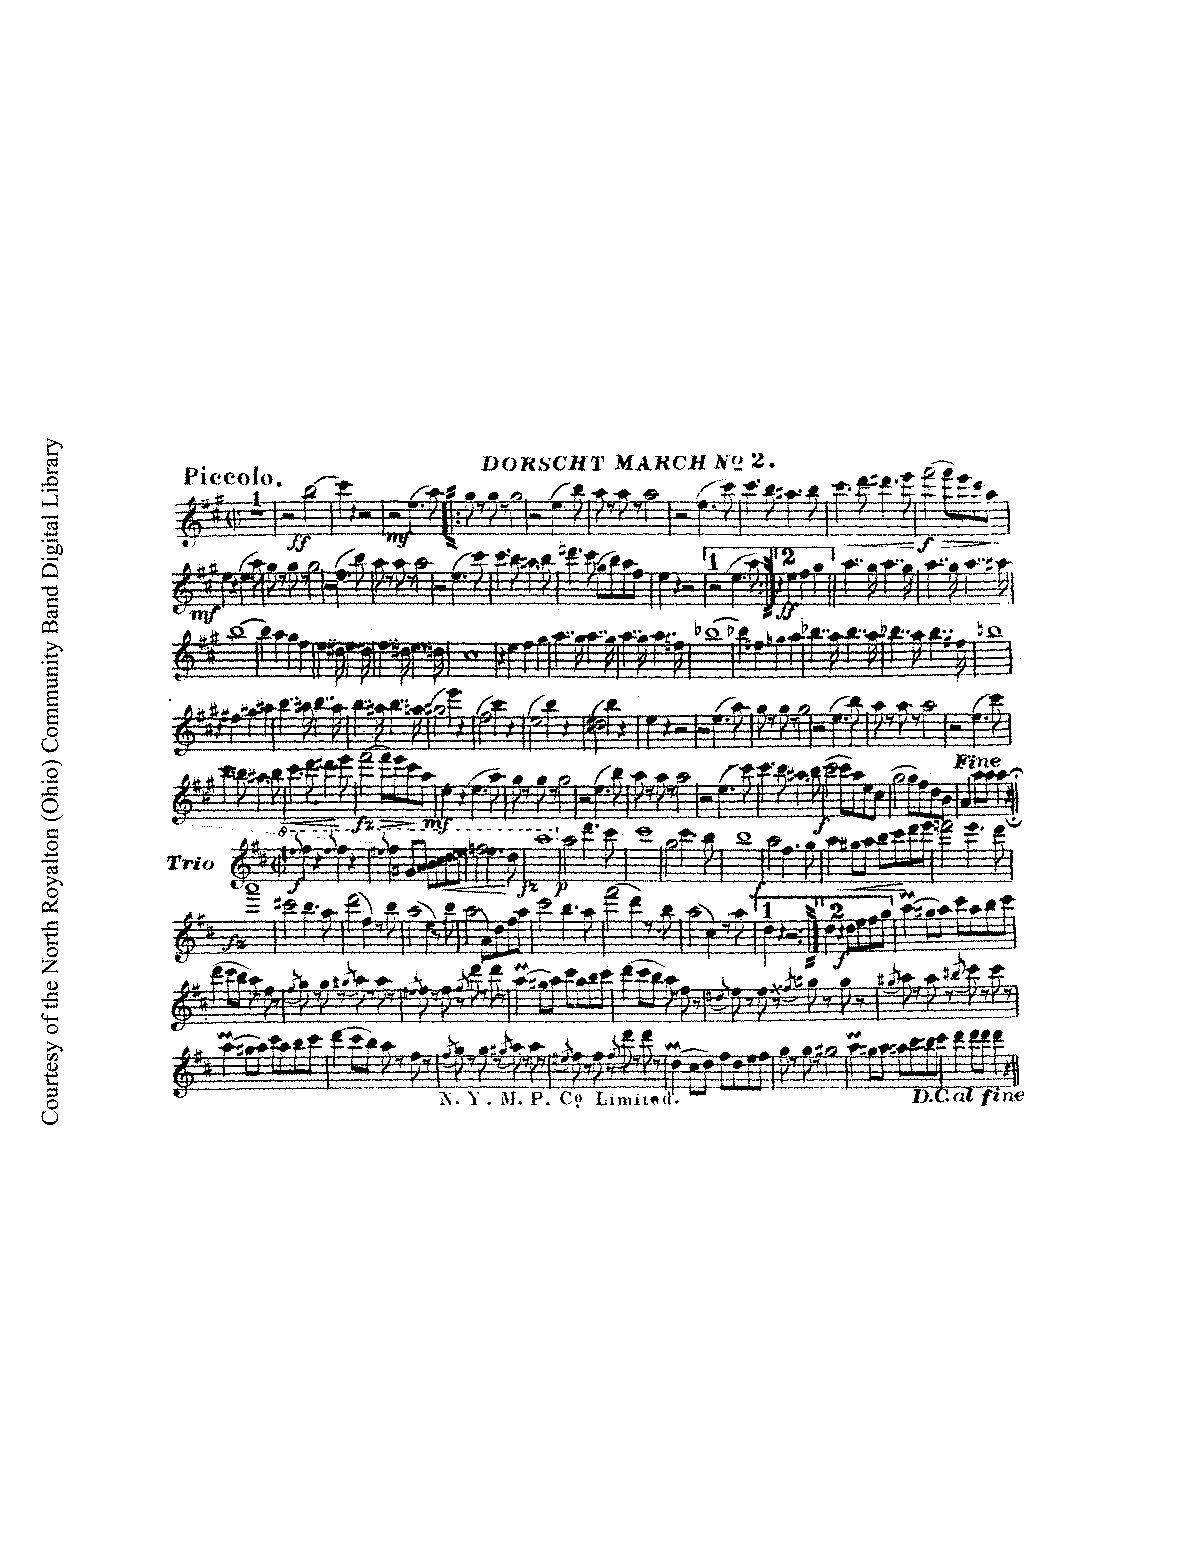 Dorscht March No 2 (Wiegand, George) - IMSLP/Petrucci Music